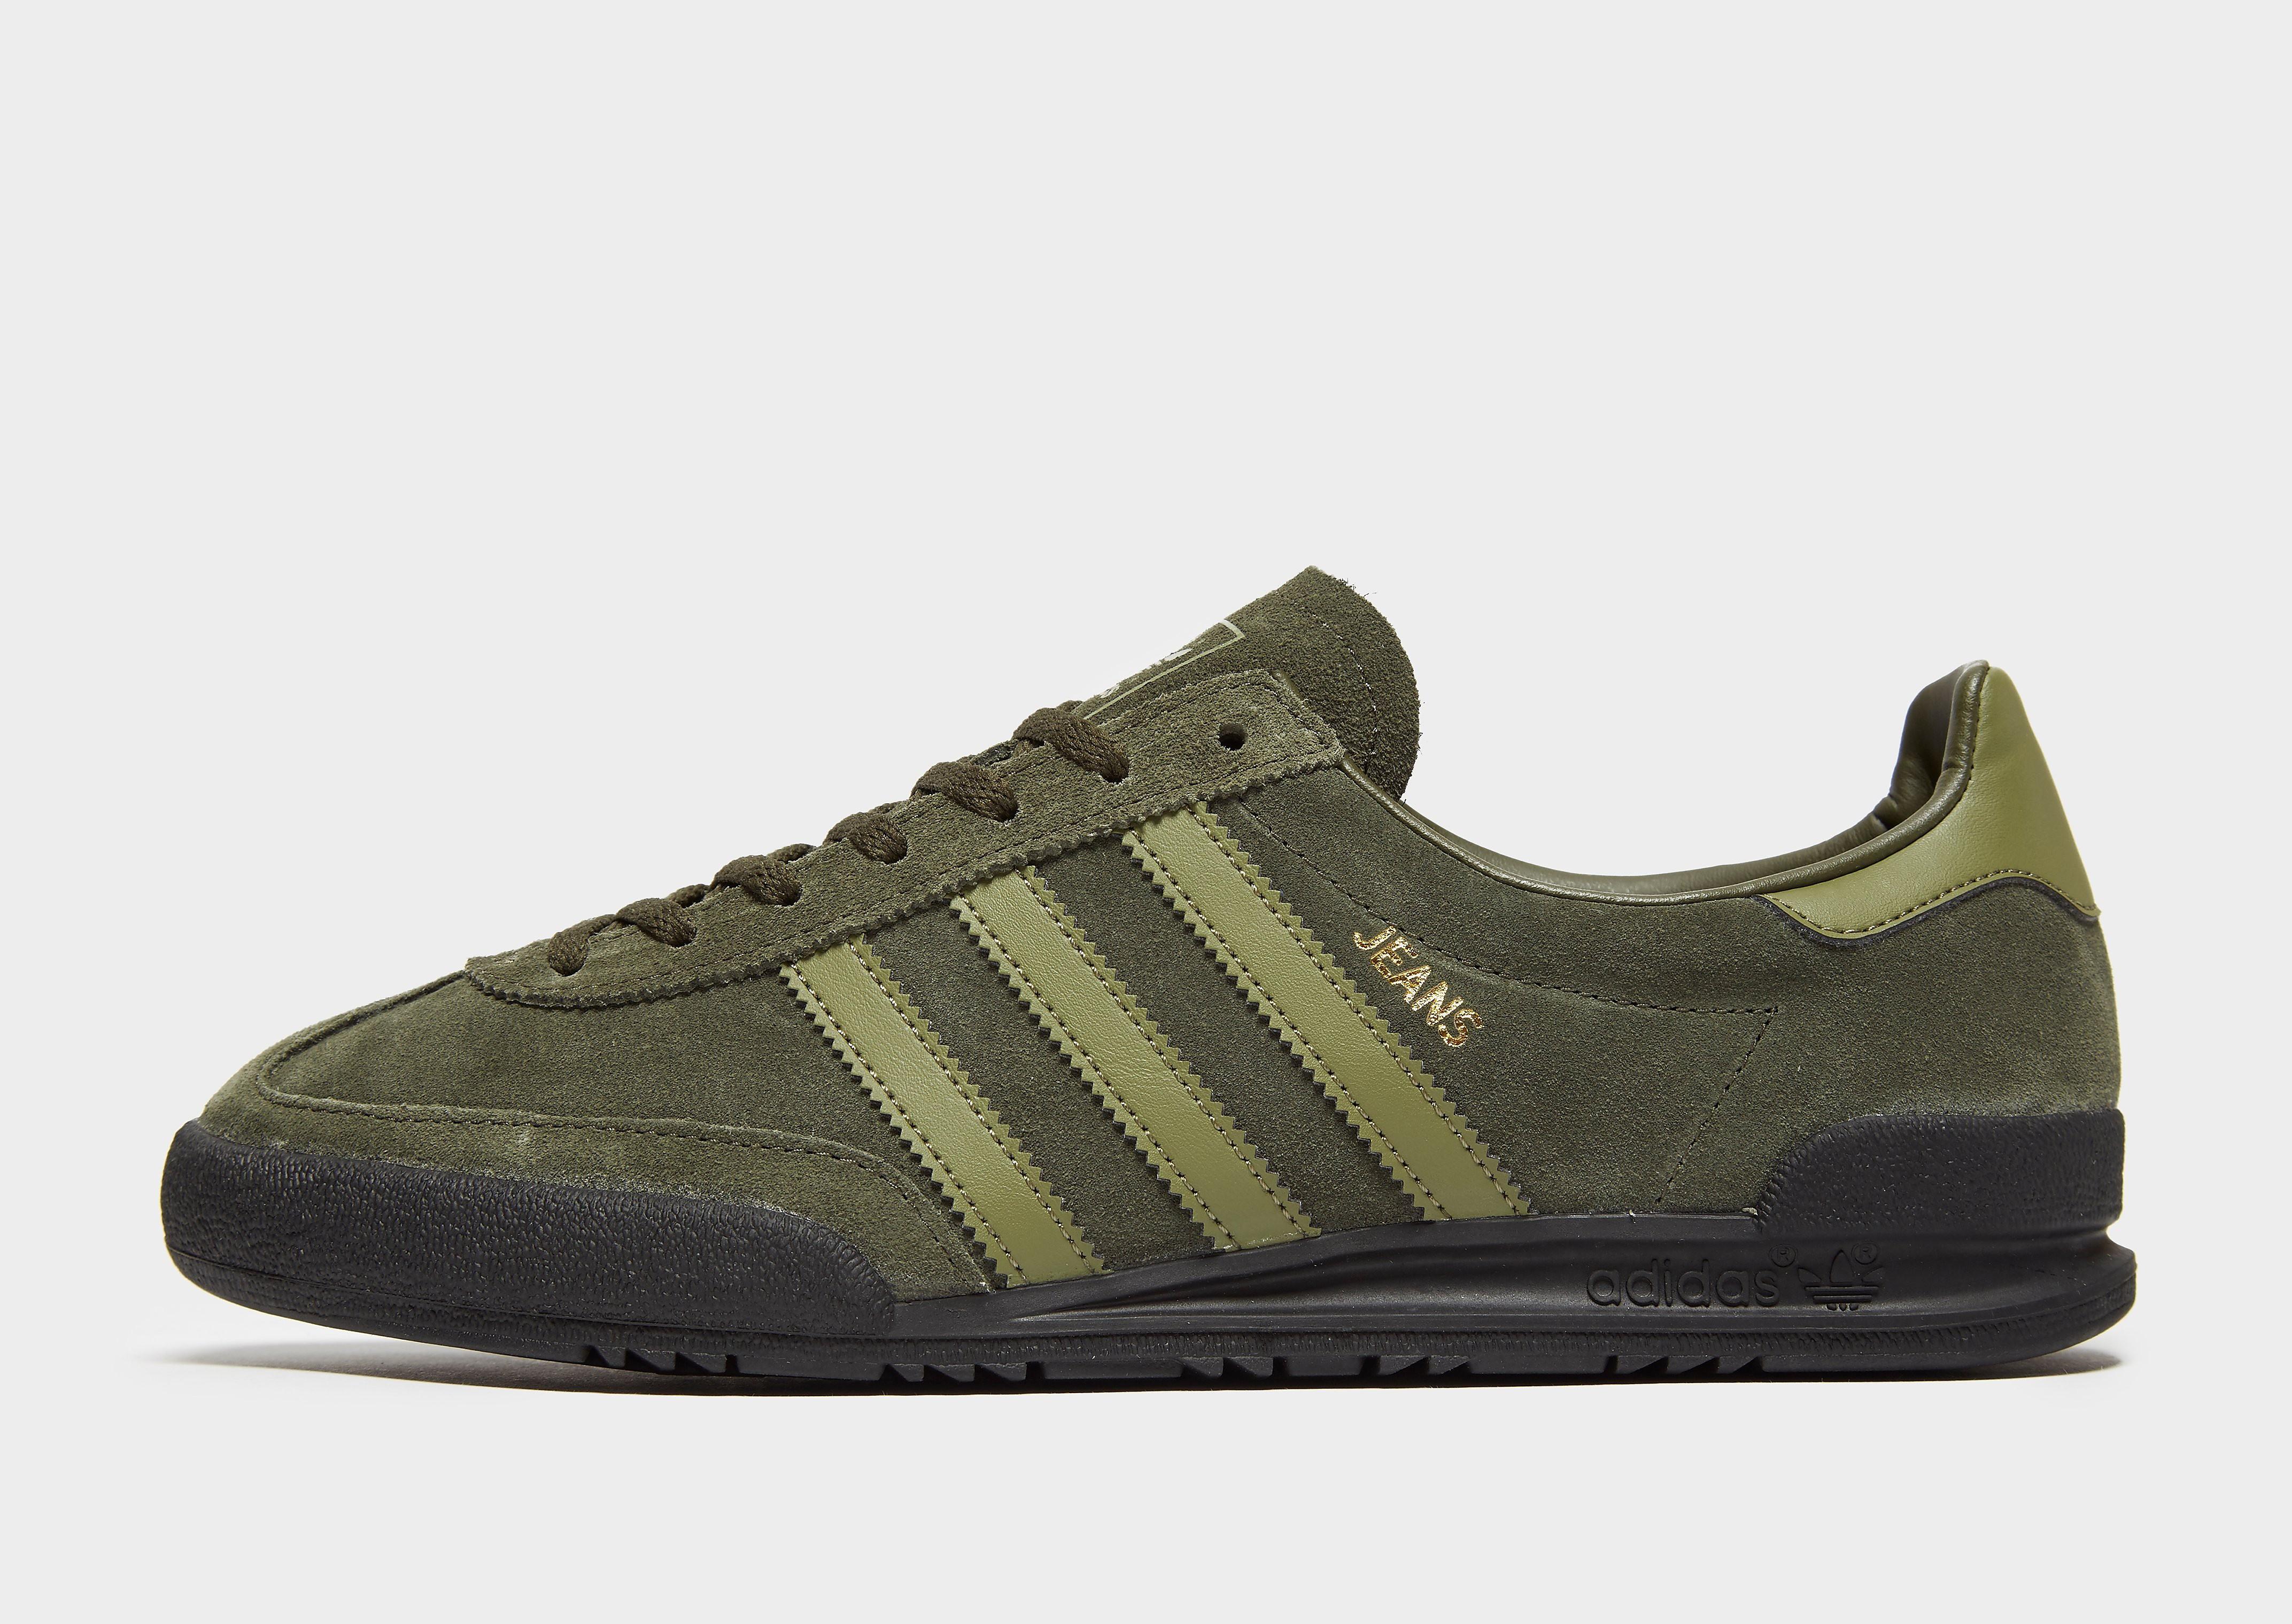 8c70c469a70f0 Precios de sneakers Adidas Jeans JD Sports verdes baratas - Ofertas ...